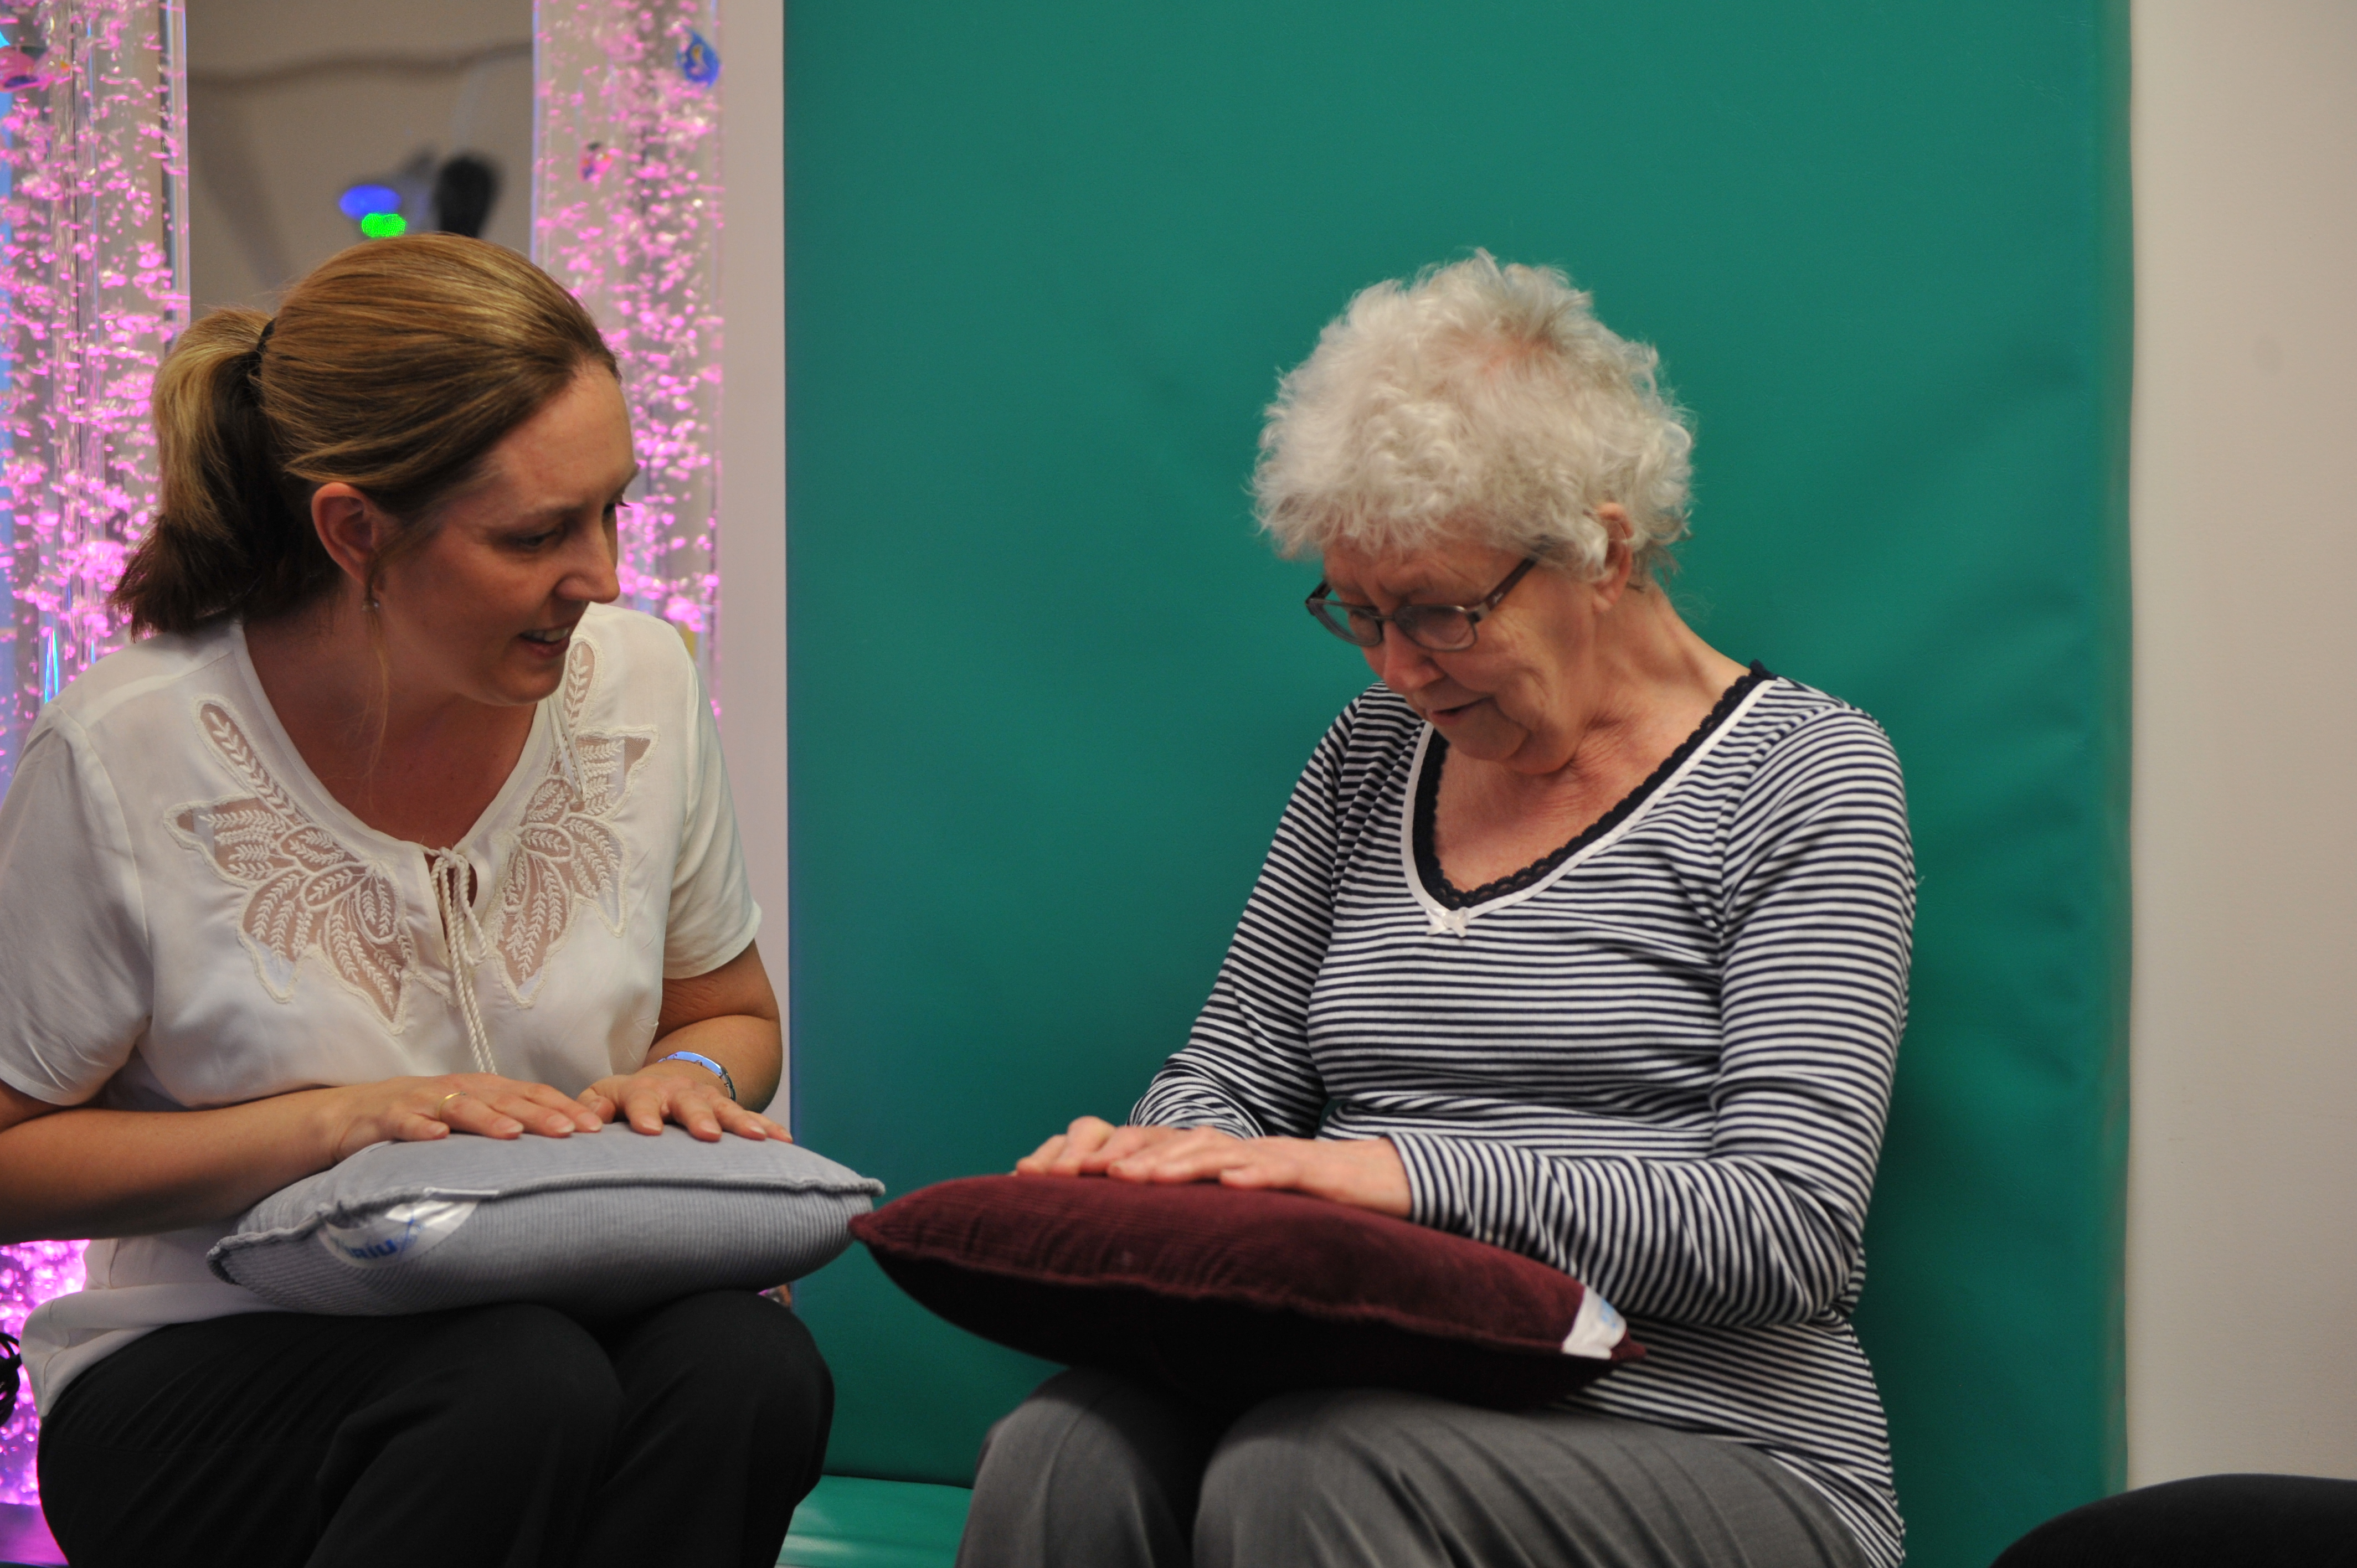 Slikovni rezultat za site: snoezelen.info dementia